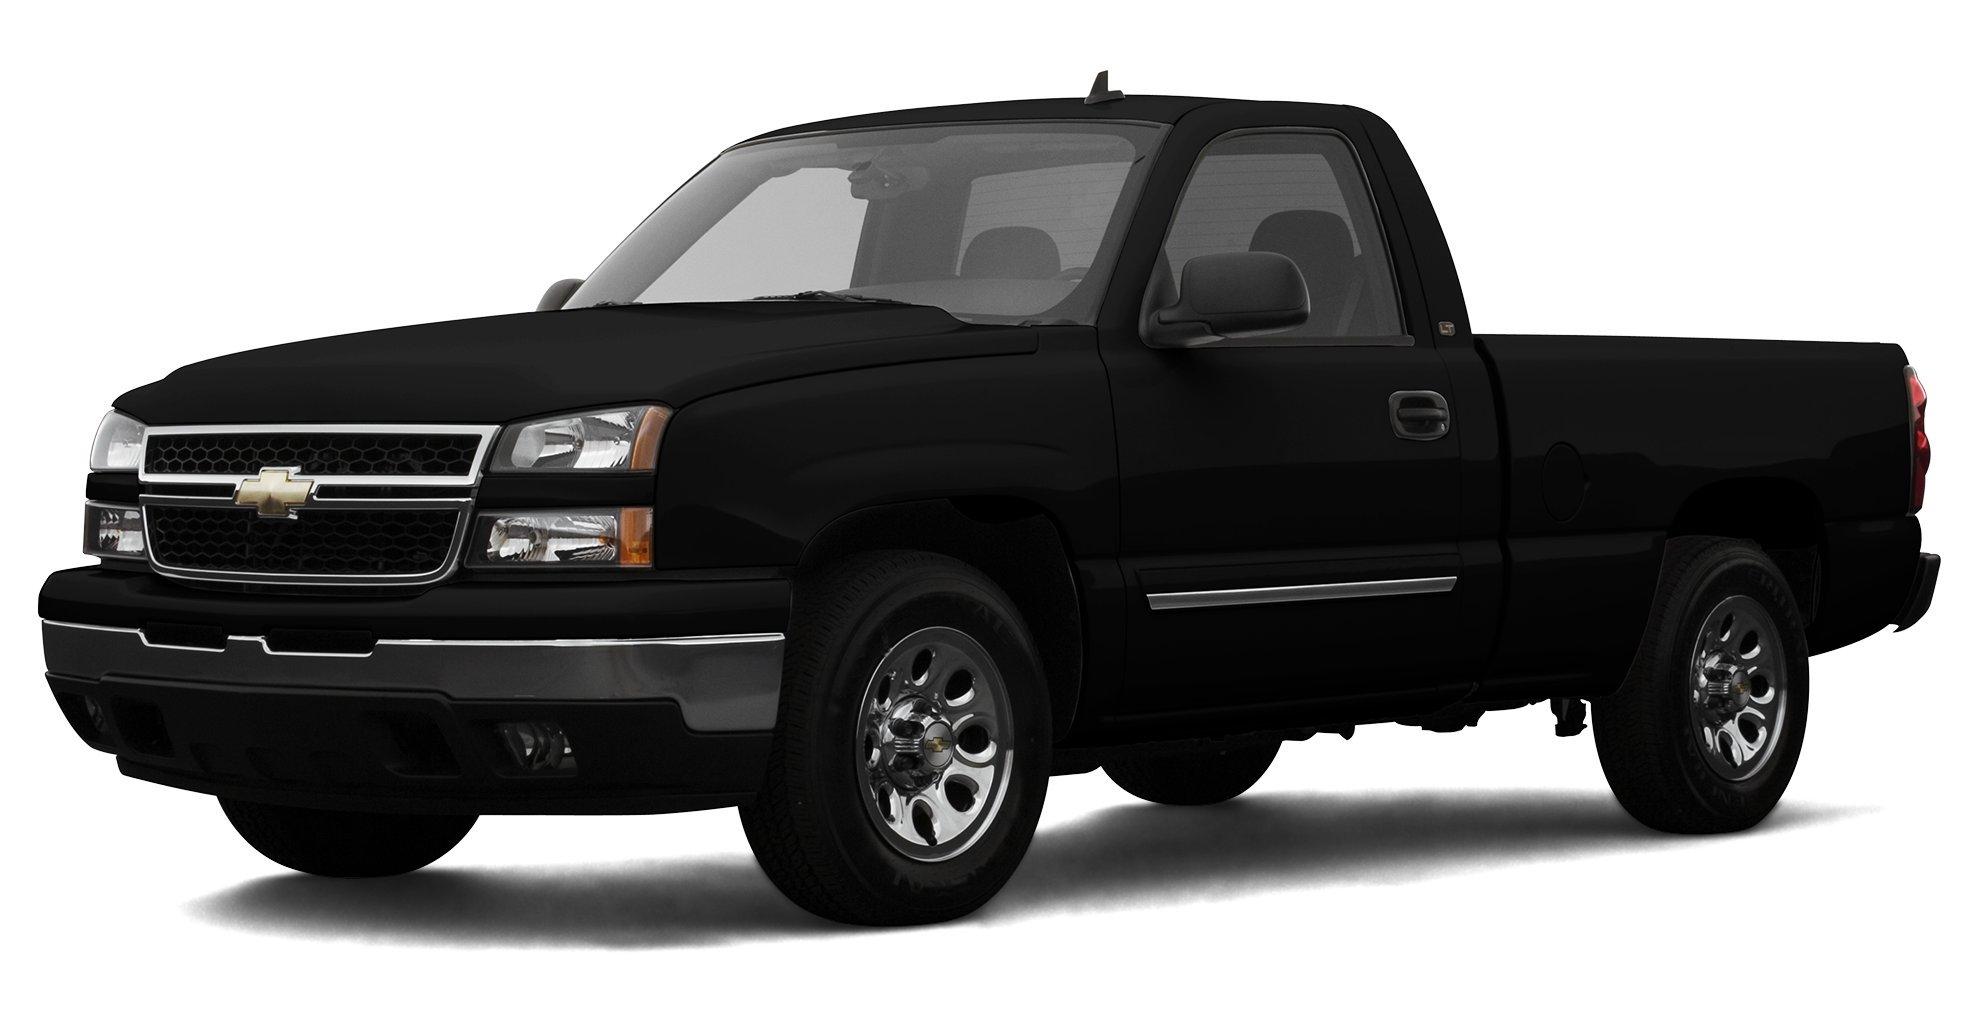 Amazon 2007 Mazda B2300 Reviews and Specs Vehicles